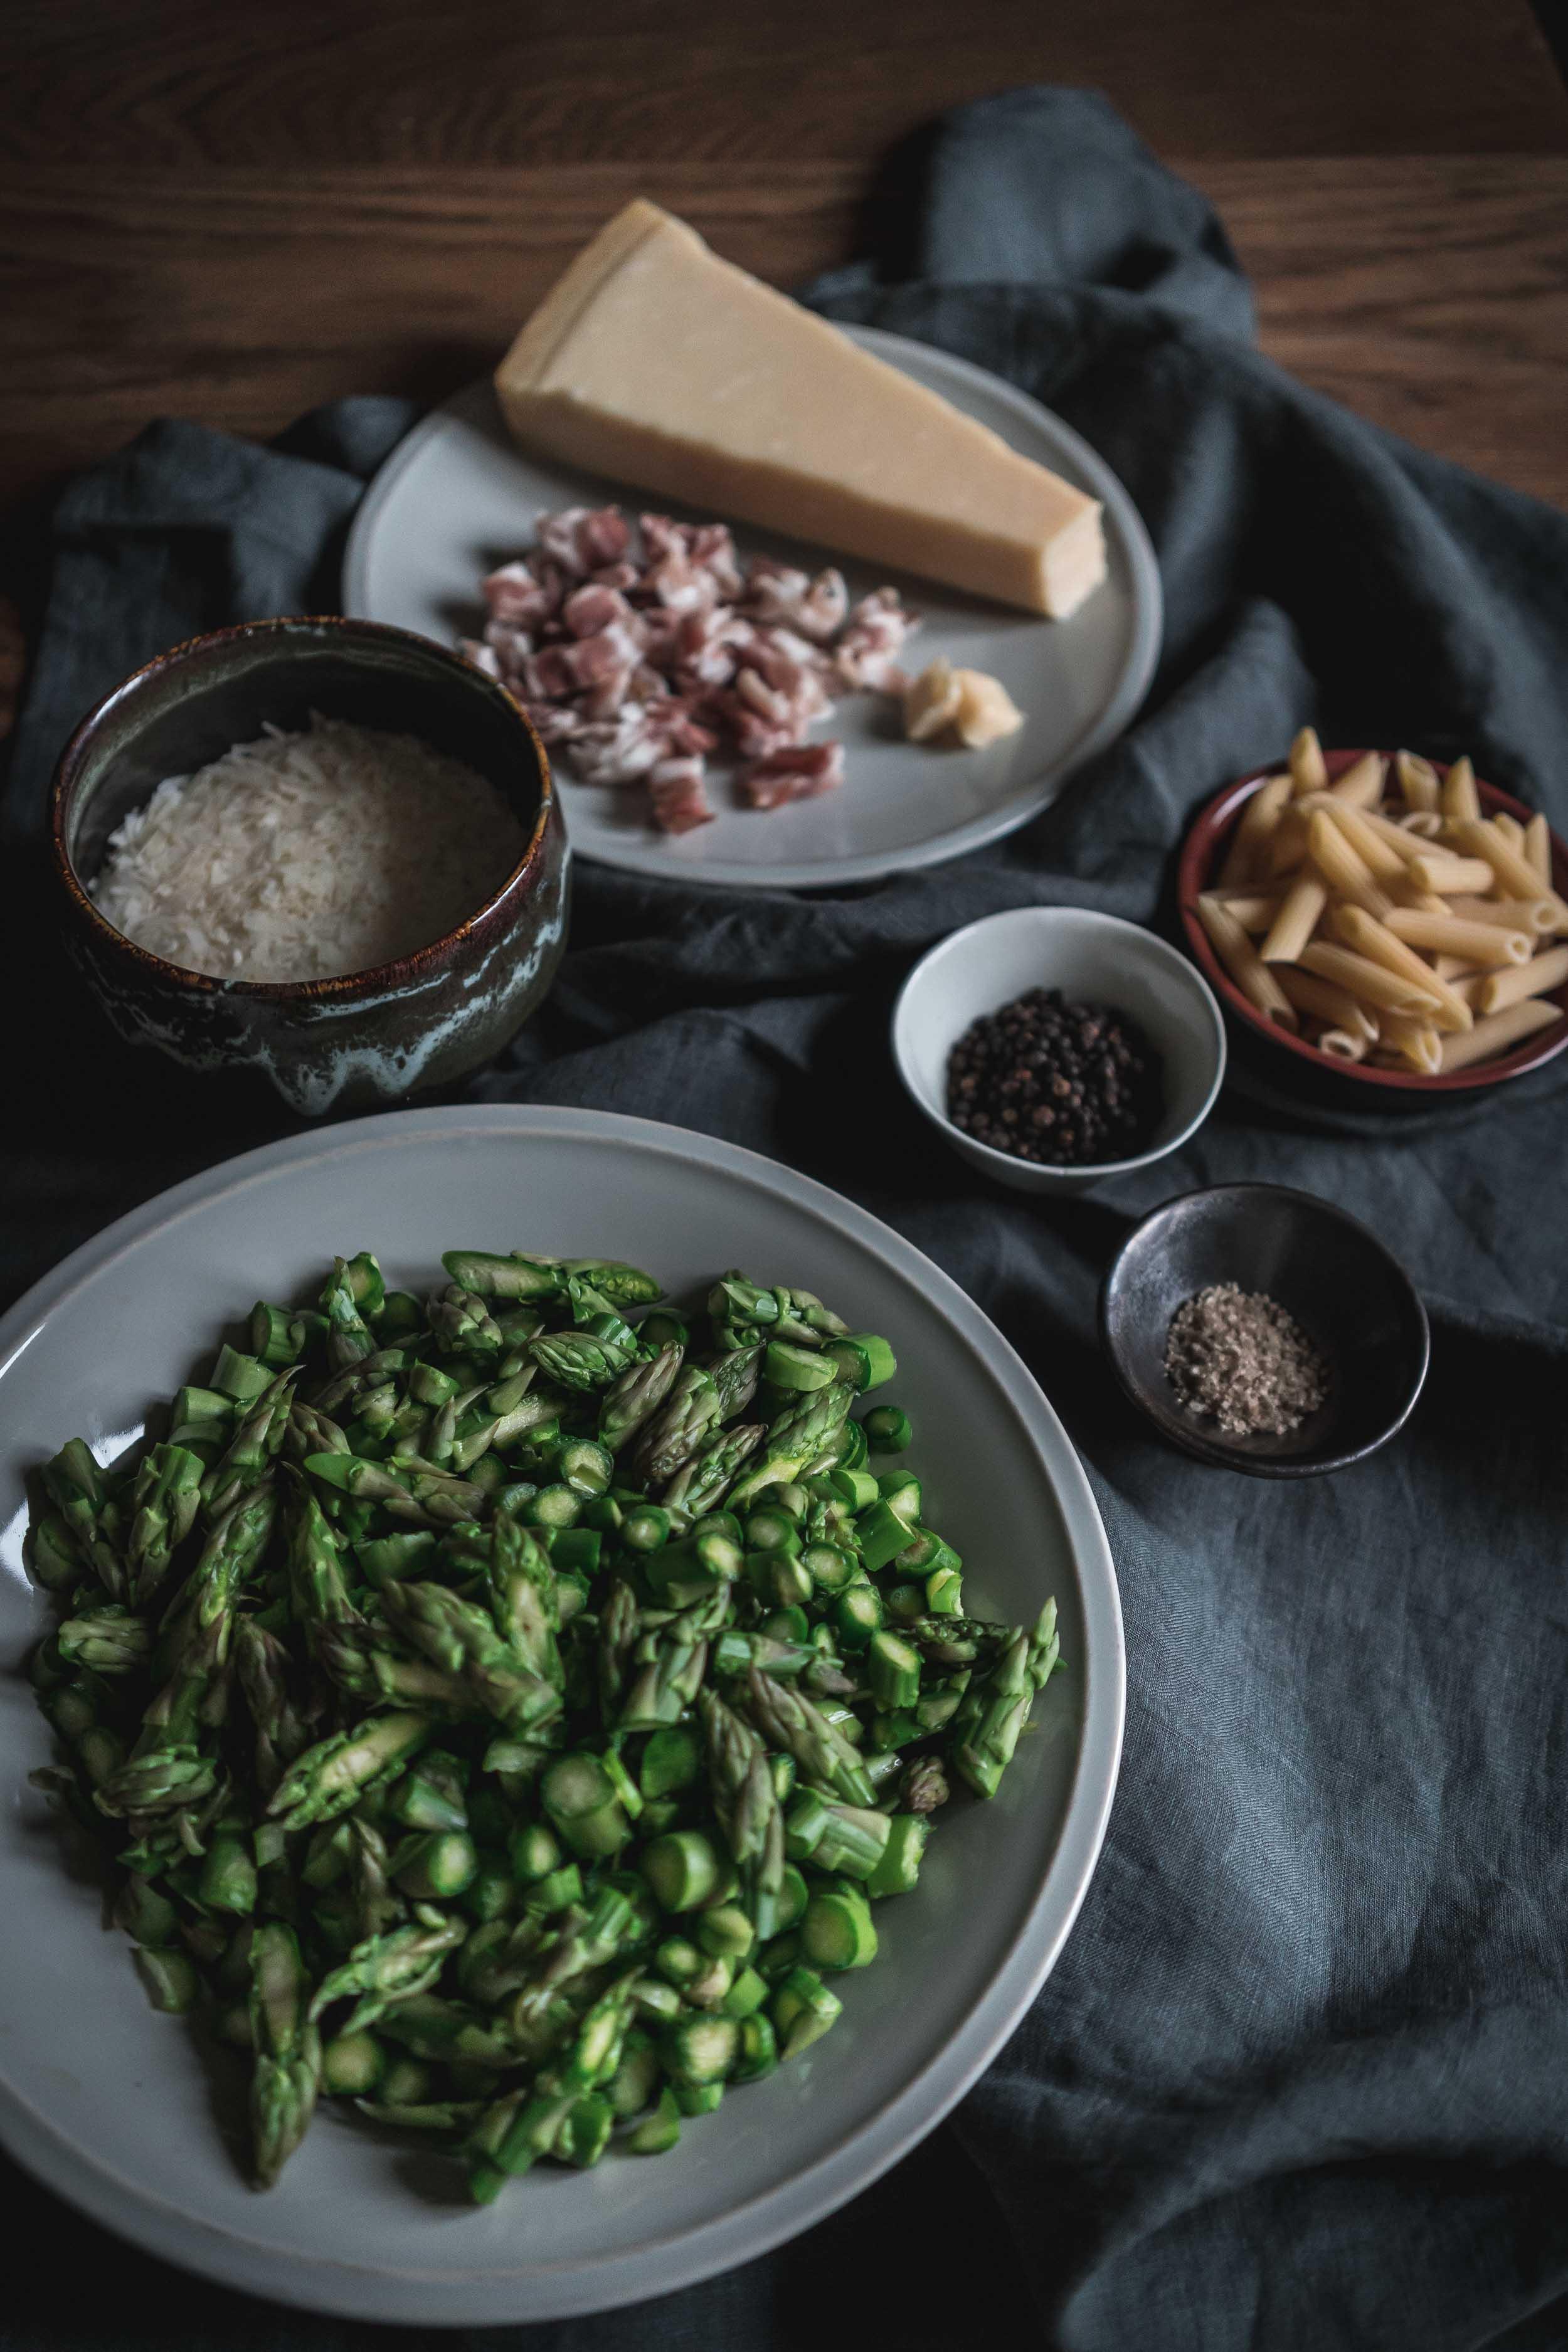 Asparagus-and-Bacon-Penne-Pasta-05096.jpg